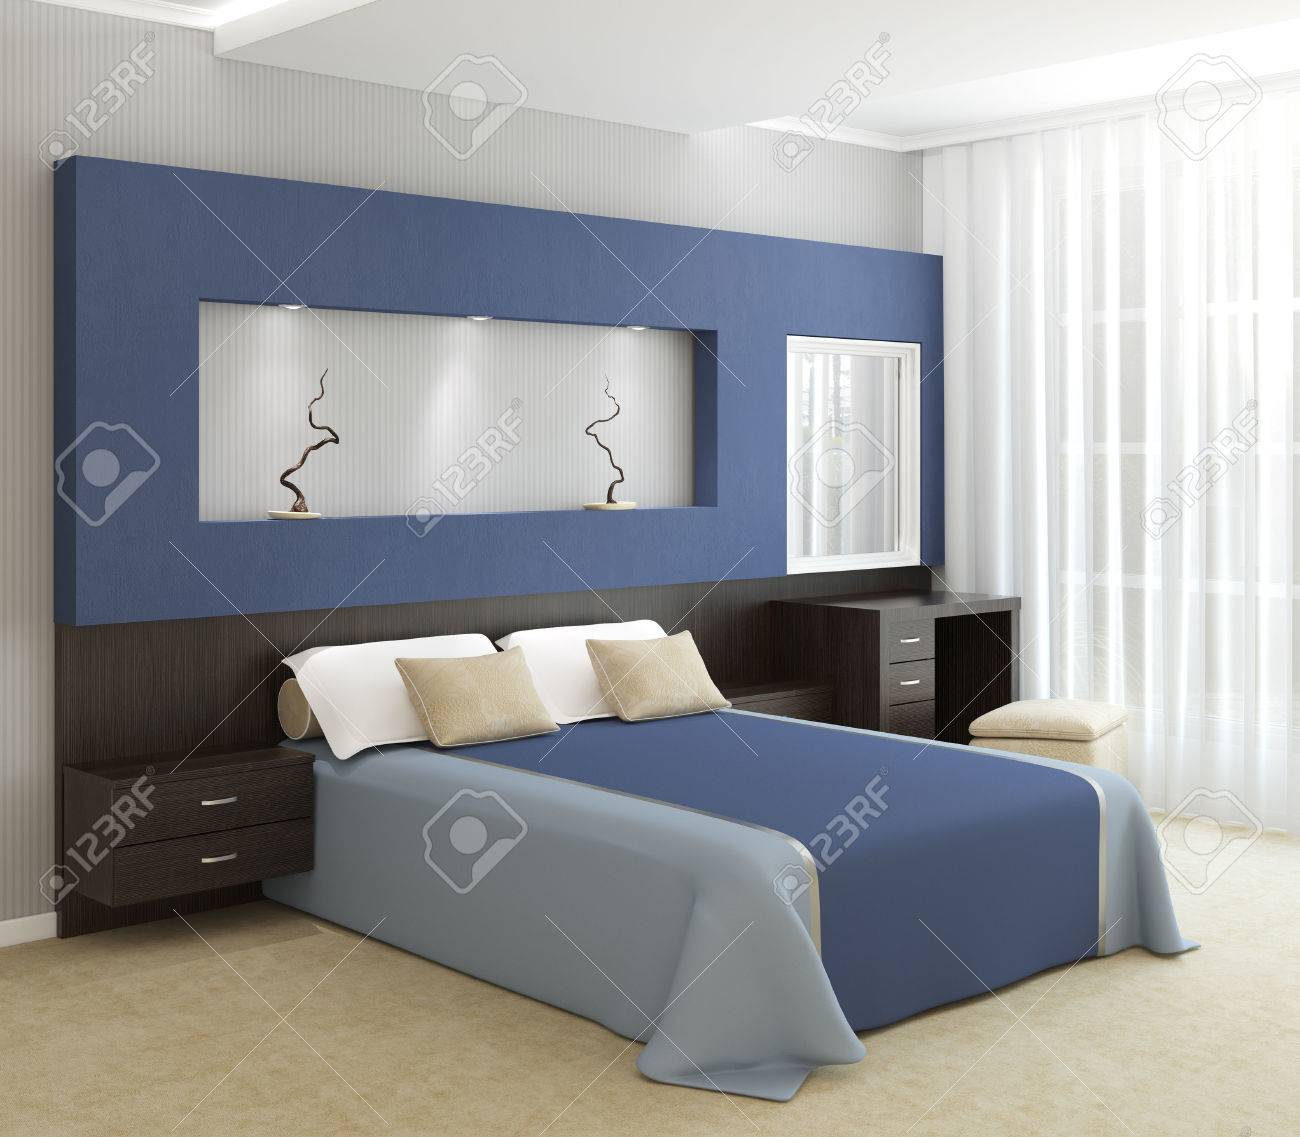 modern bedroom interior 3d render stock photo 39684271